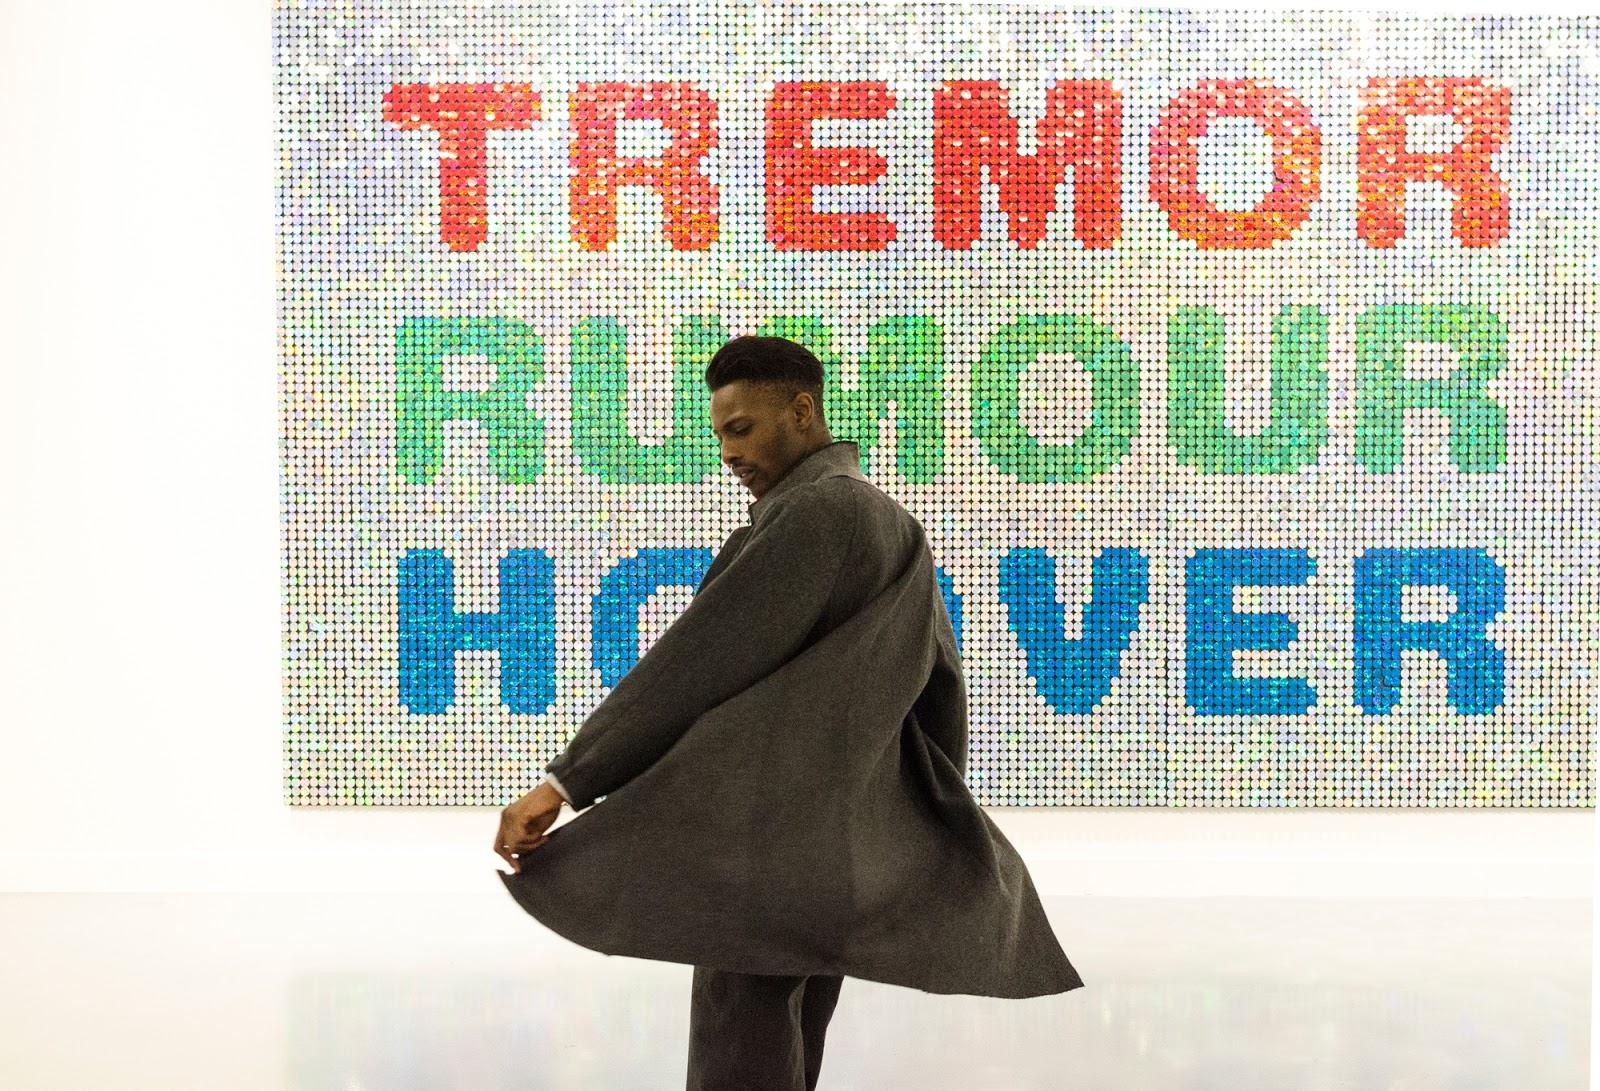 When Art & Fashion Meets by jonthegold - wearing my special sweater by BELMODO X O'REN in the mhka antwerp with a streetstyle